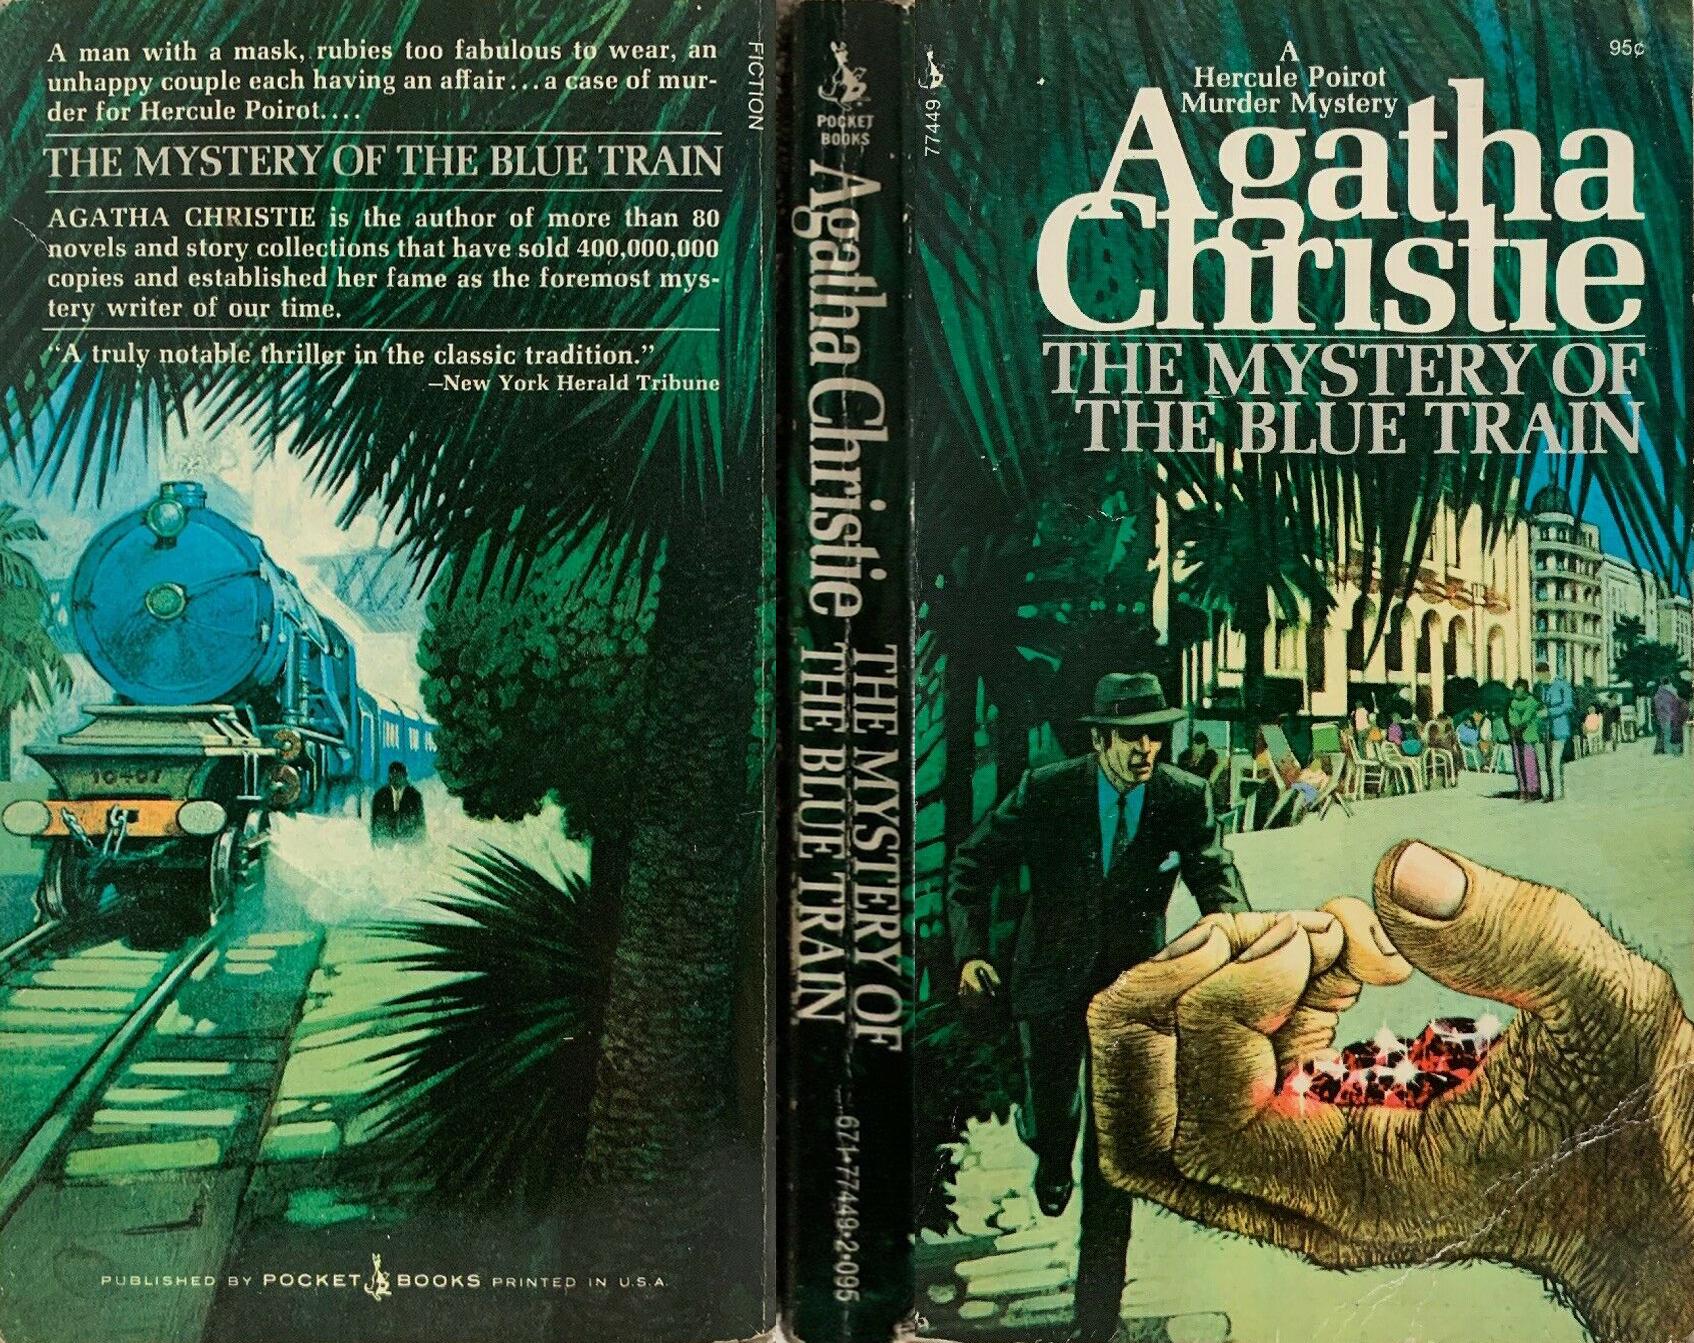 Agatha Christie Tom Adams The Mystery of the Blue Train Pocket